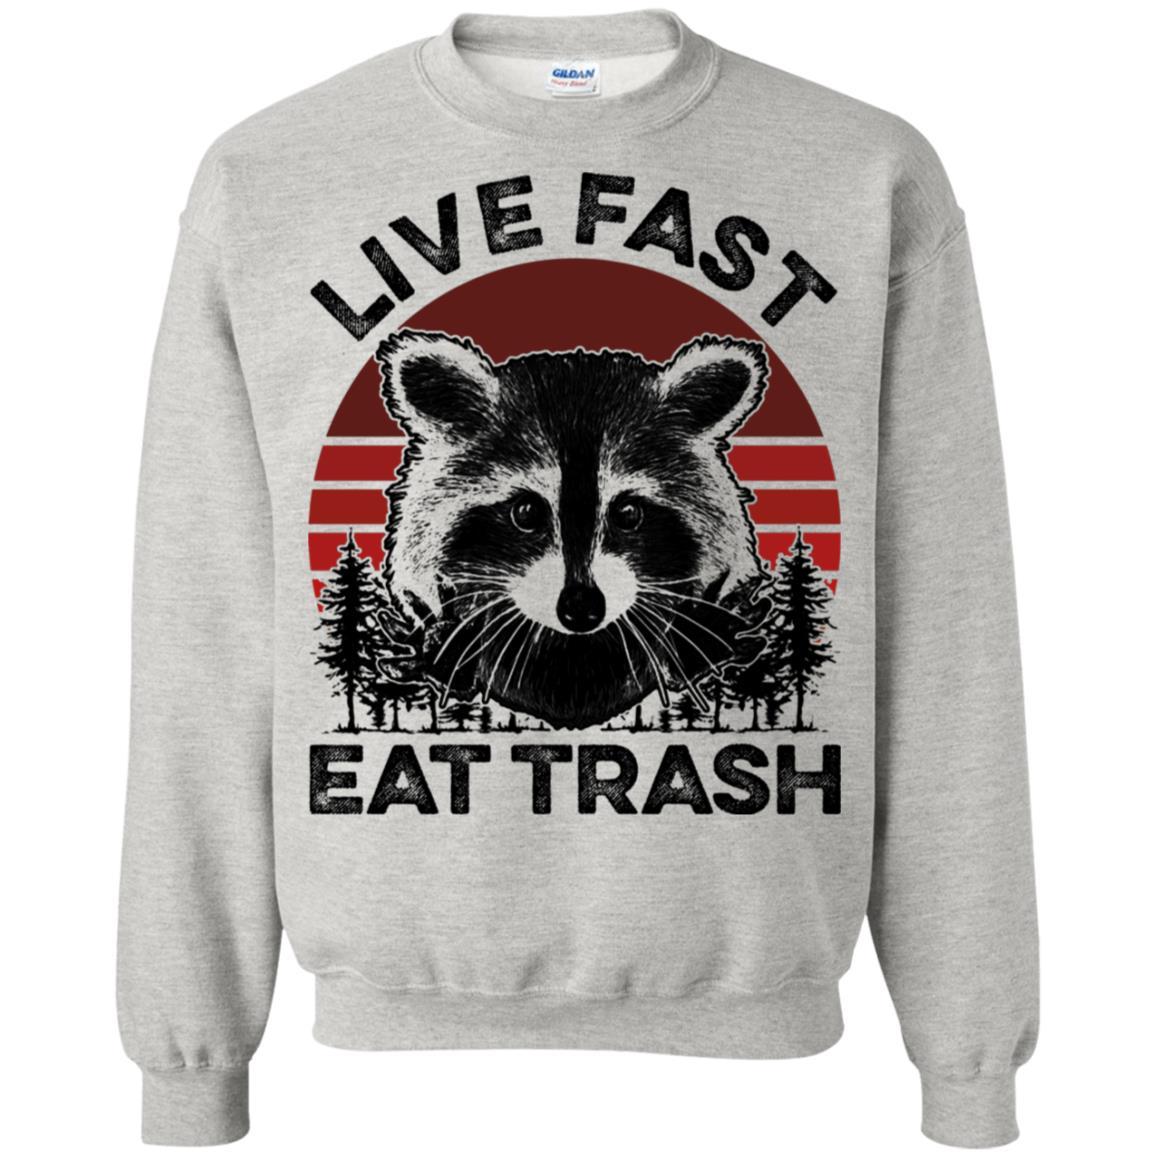 Raccoon Vintage Live Fast Eat Trash Gildan T-Shirt  Black Size S-3XL